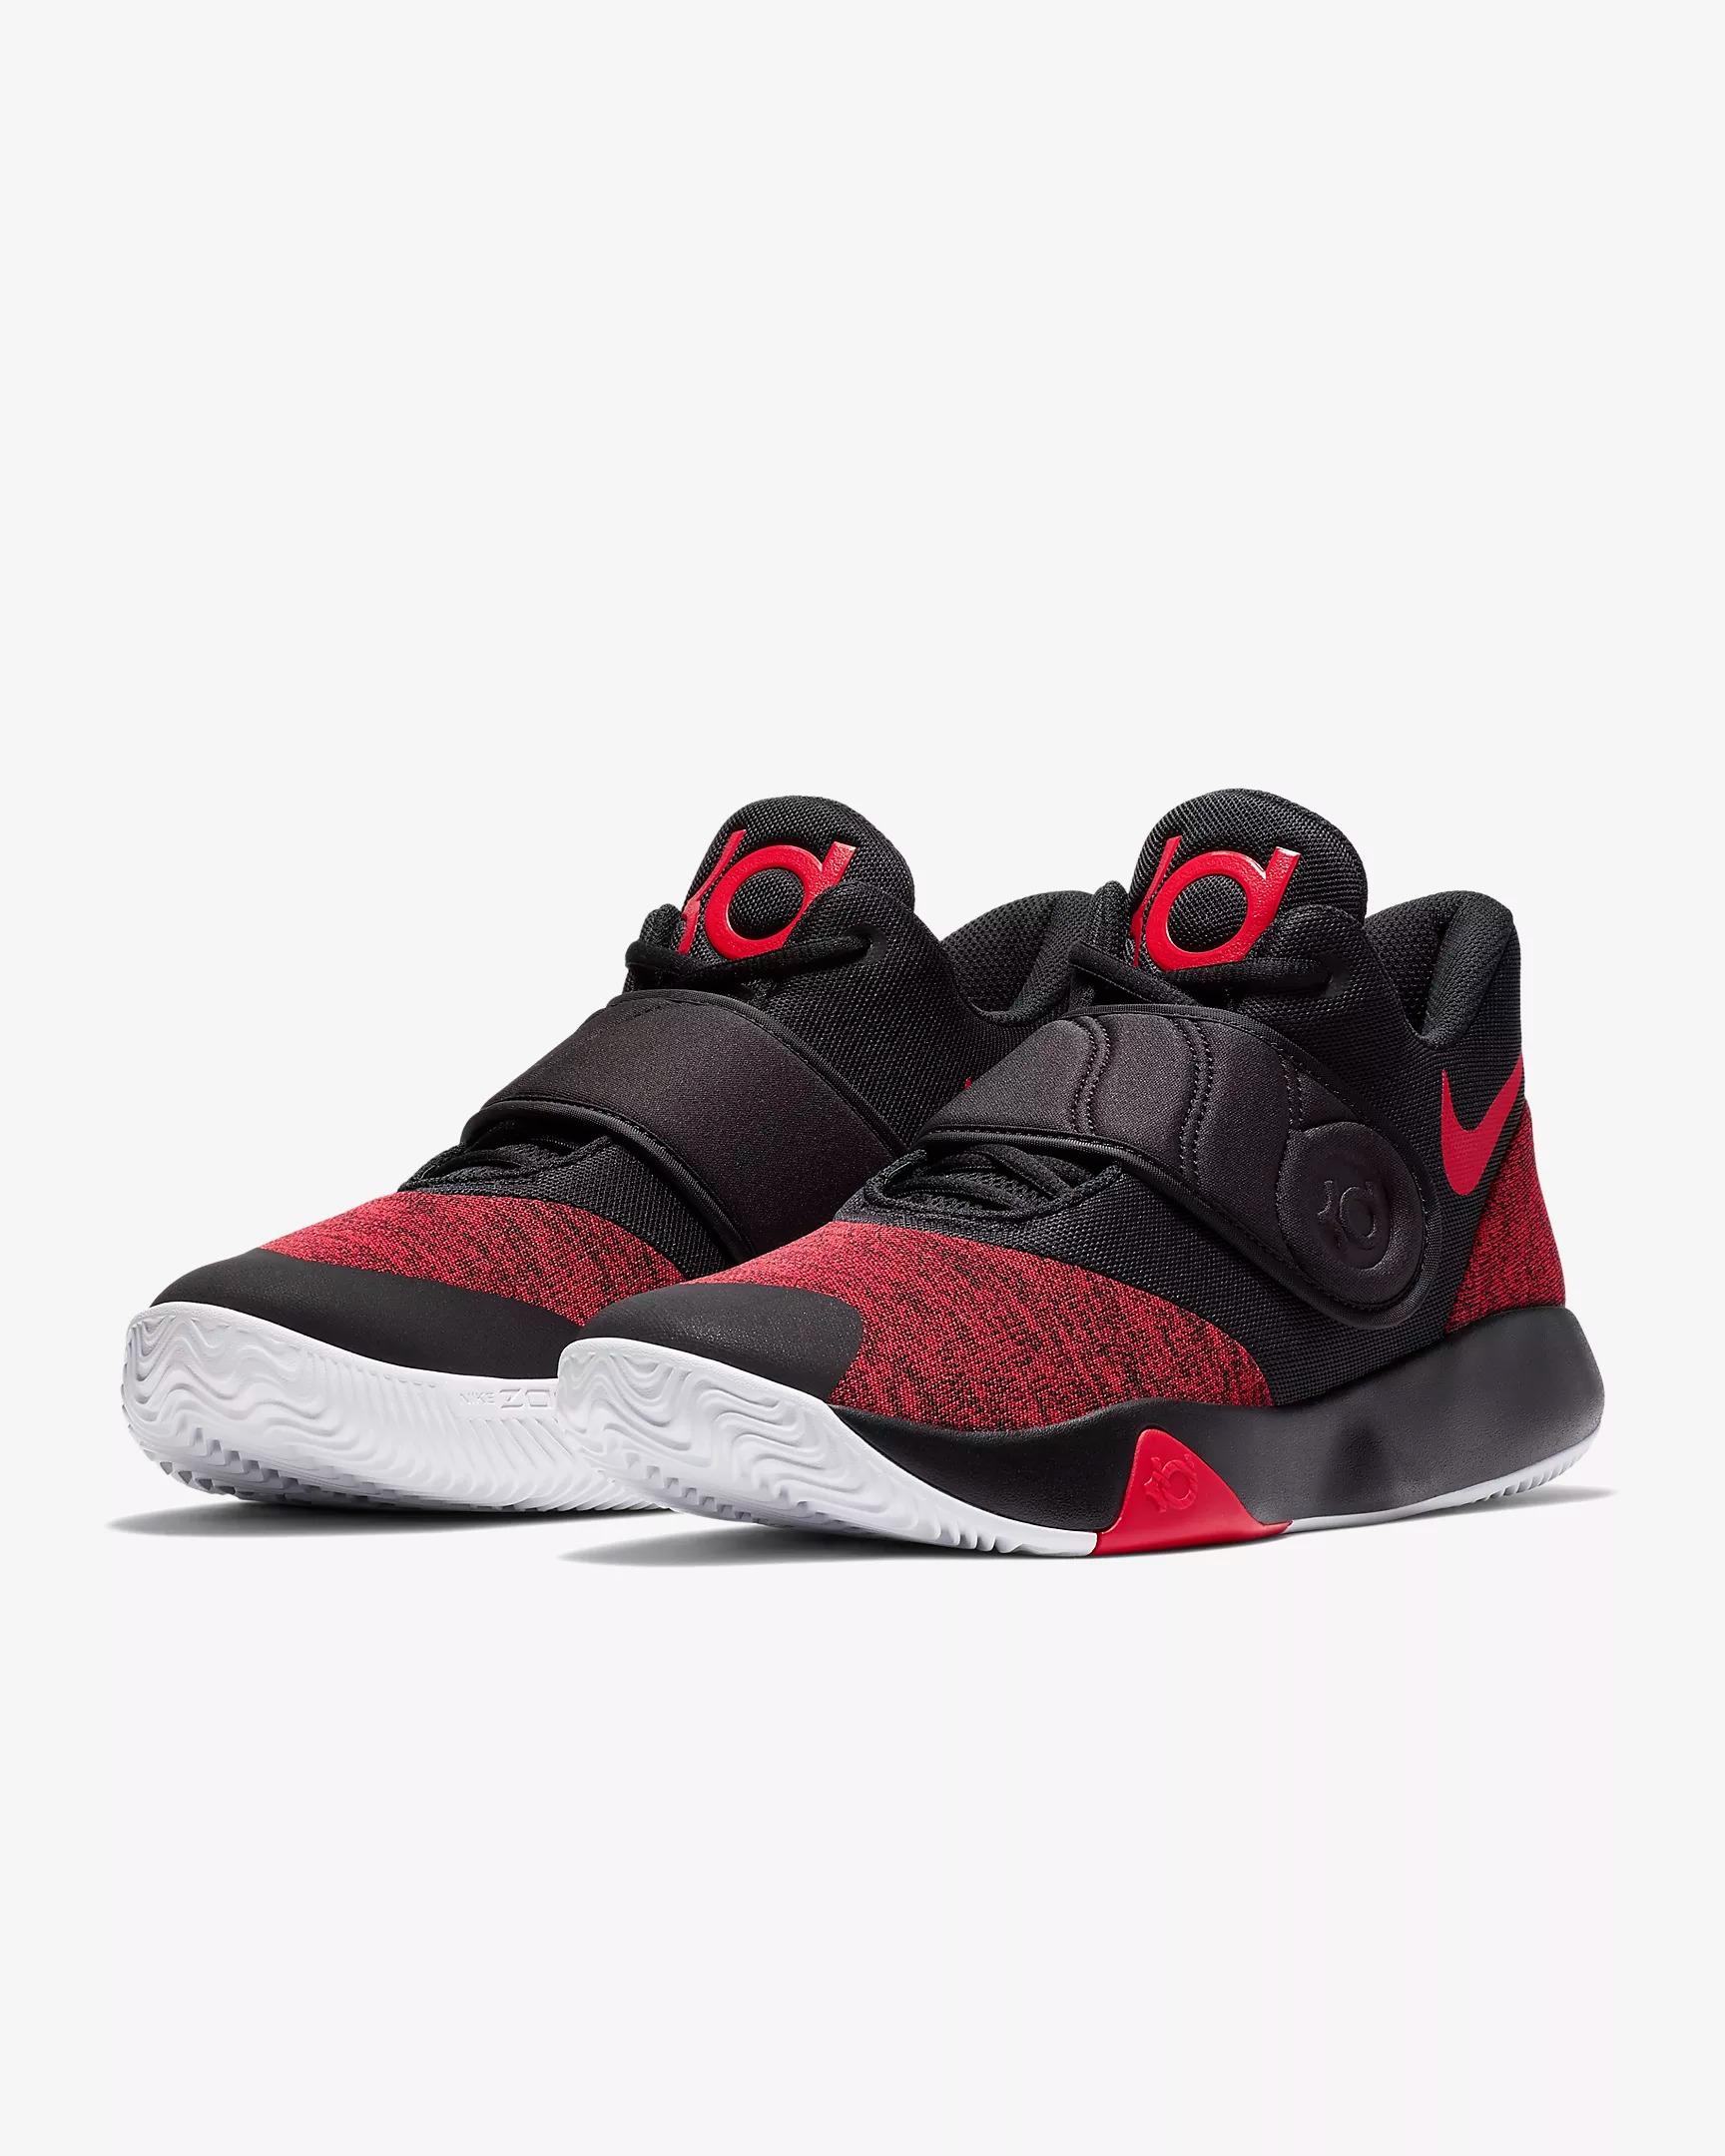 Nike KD Trey 5 VI Basketball Shoes - BASKETBALL SHOES NIKE Basketball Shoes  - Superfanas.lt 2808930df